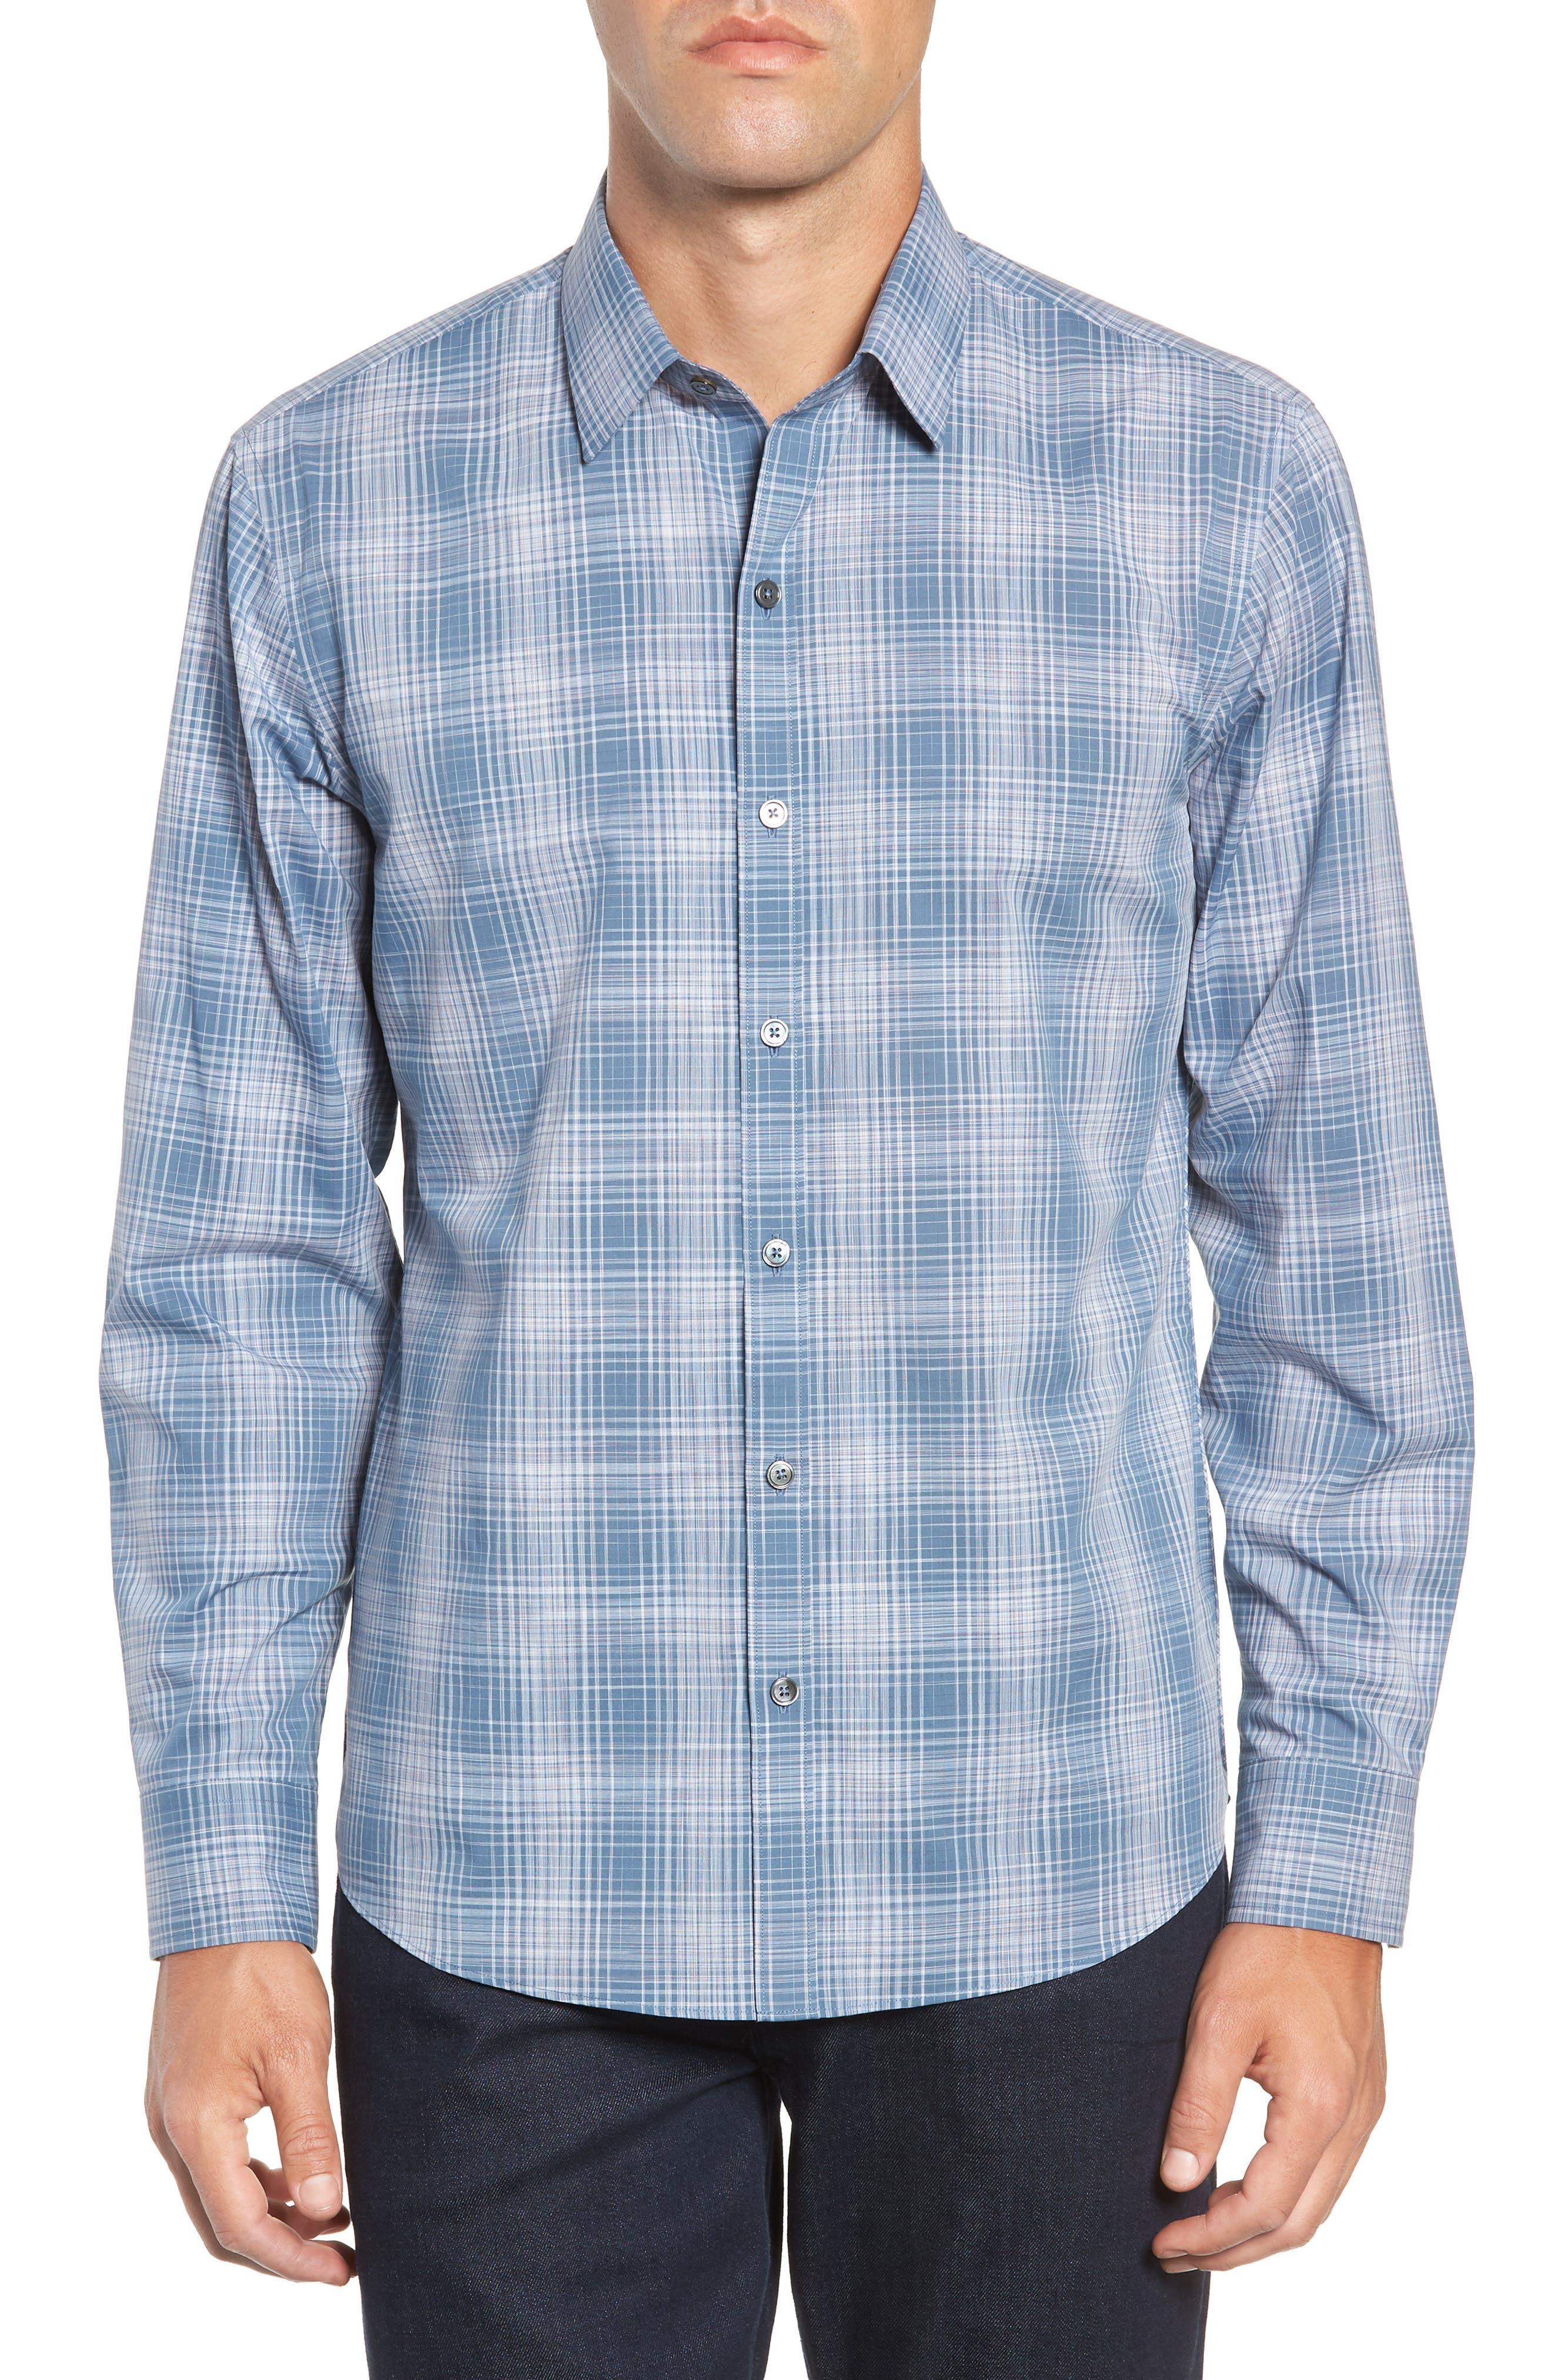 Slater Check Sport Shirt,                             Main thumbnail 1, color,                             PALE BLUE